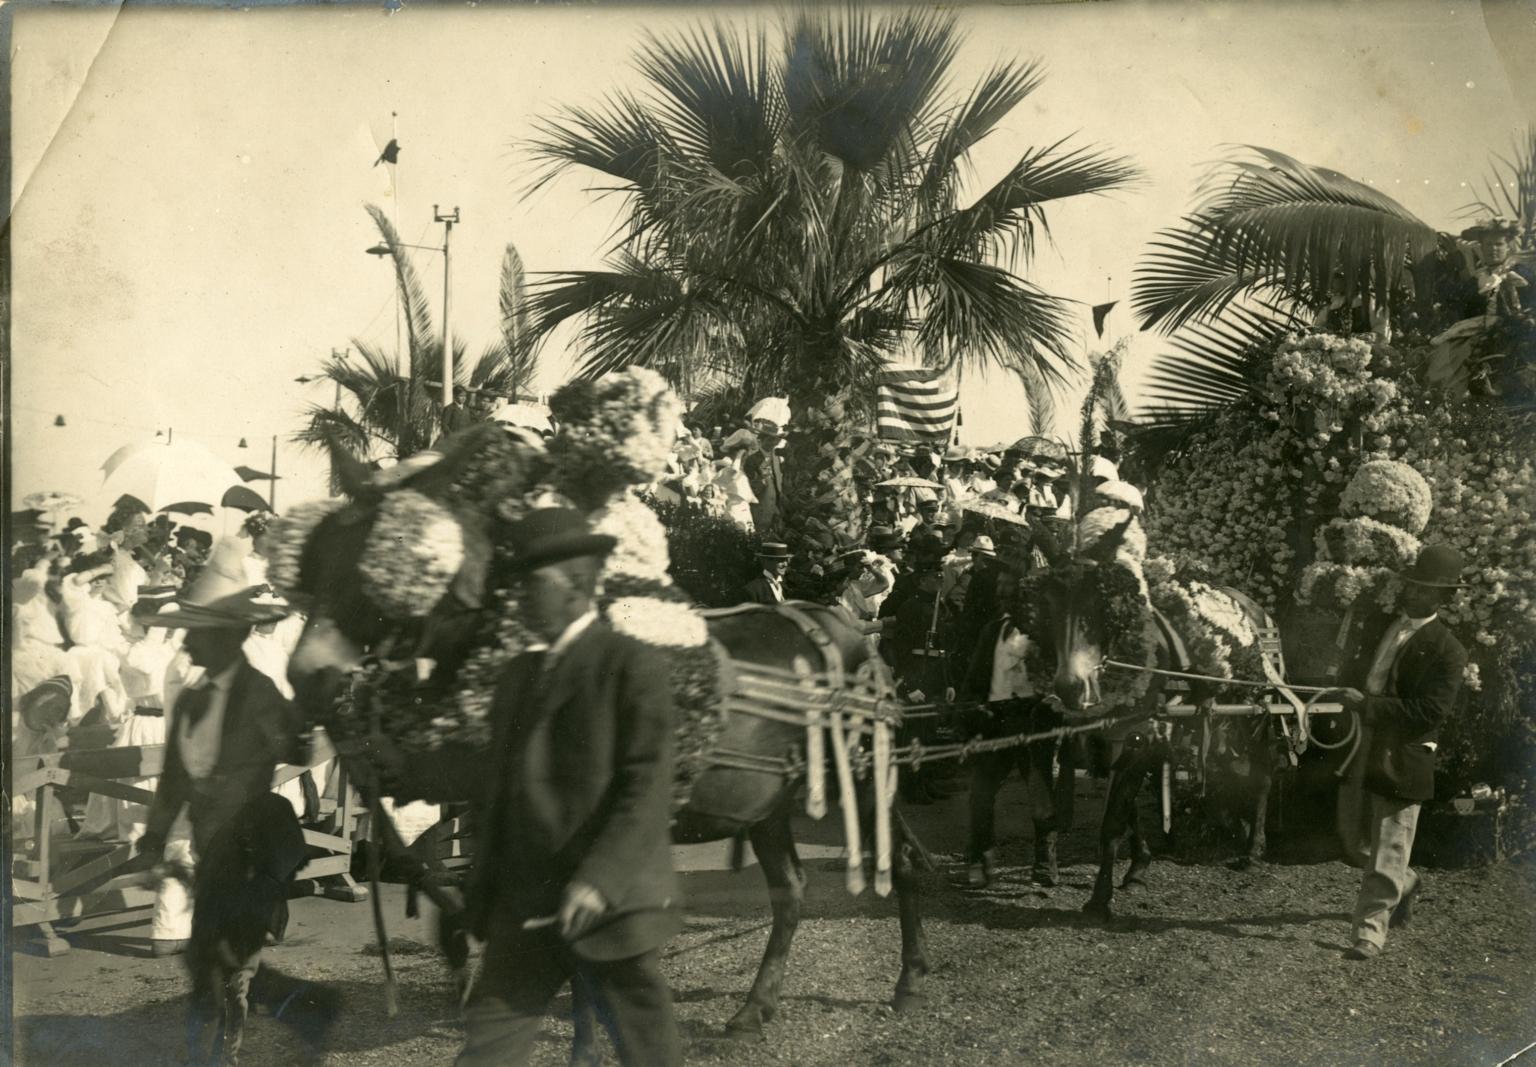 Floral Parade